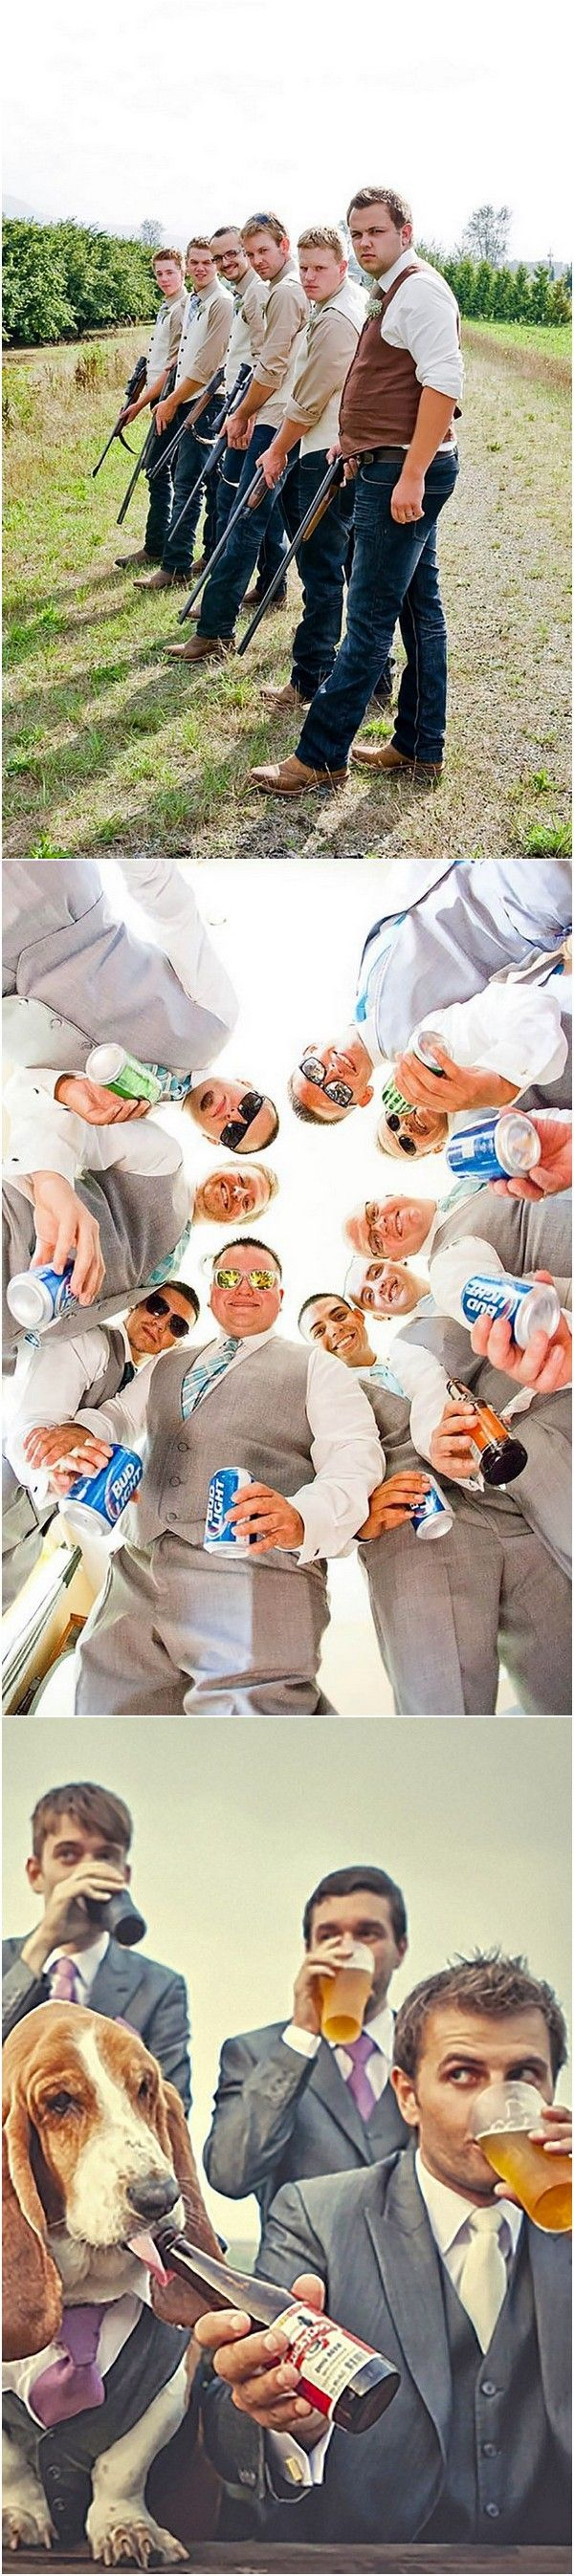 funny groomsmen wedding photo ideas